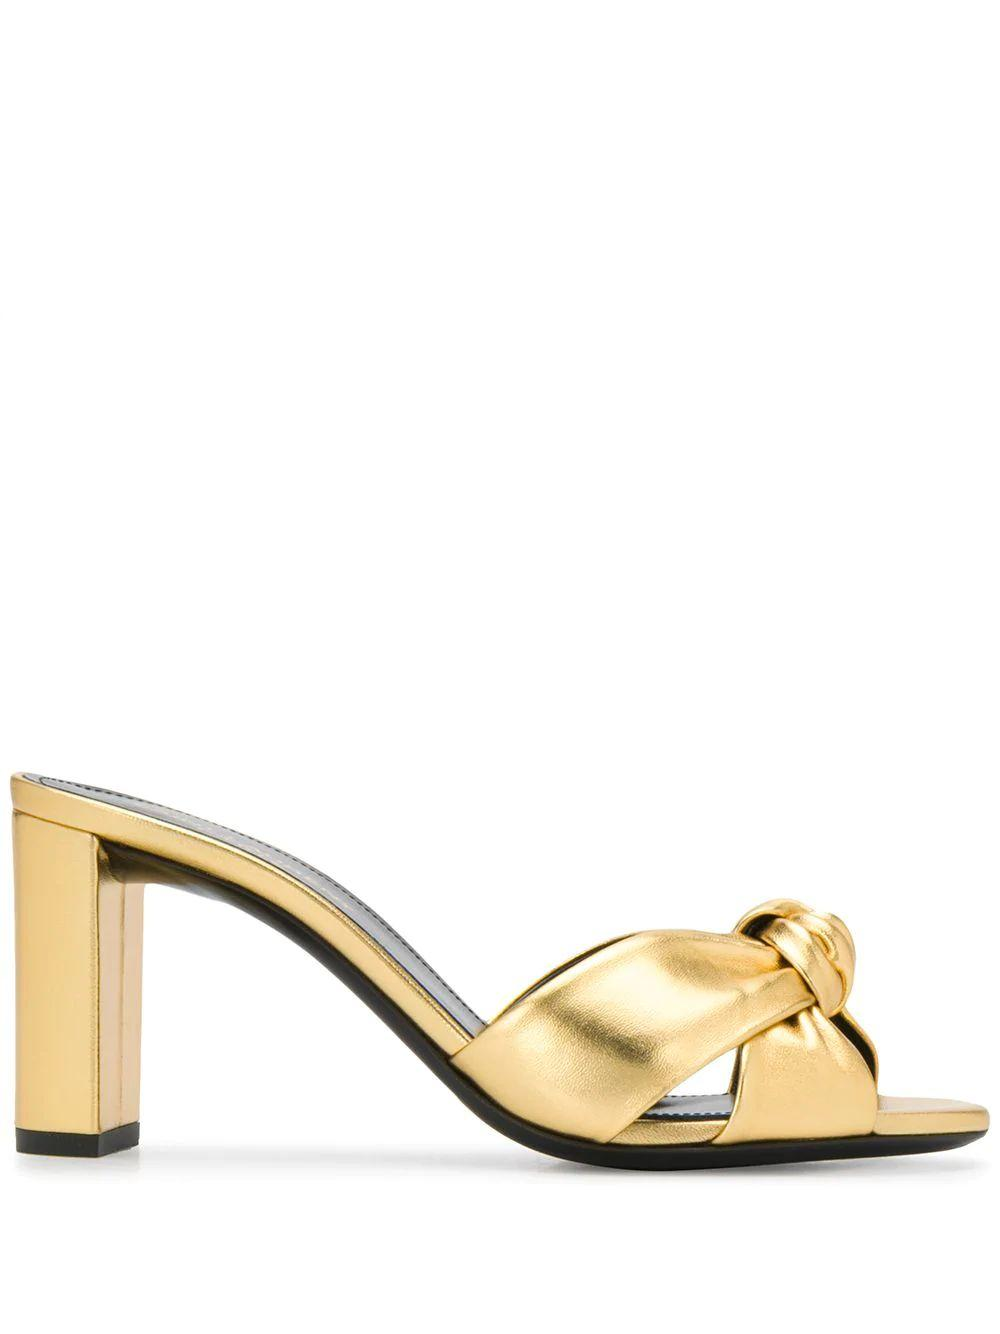 Loulou 75mm Silky Mule Sandal Item # 6201300XQ00